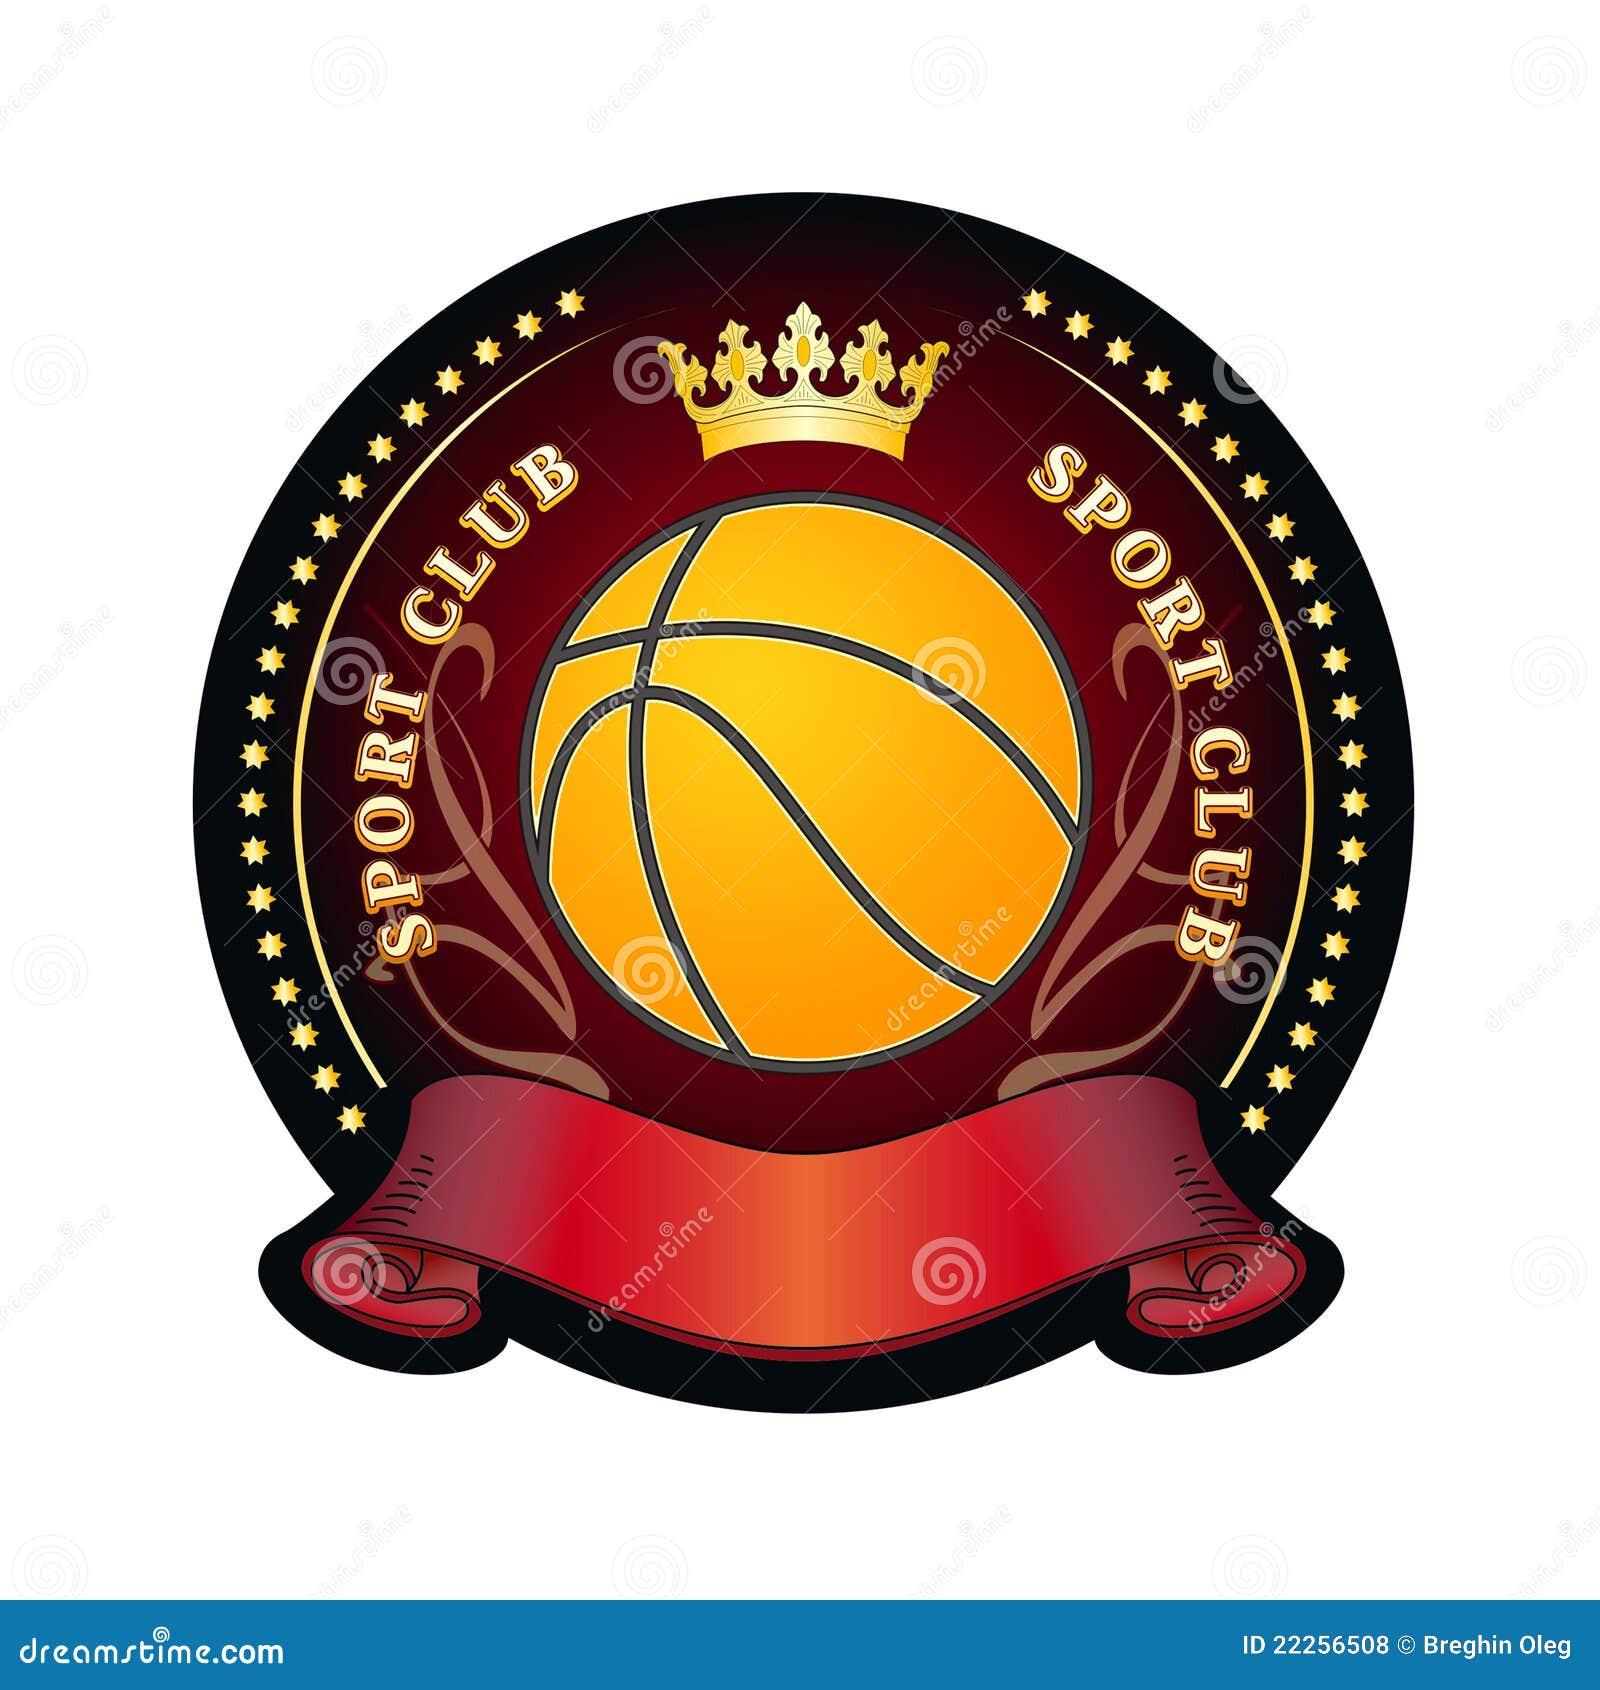 спорт картинки эмблема